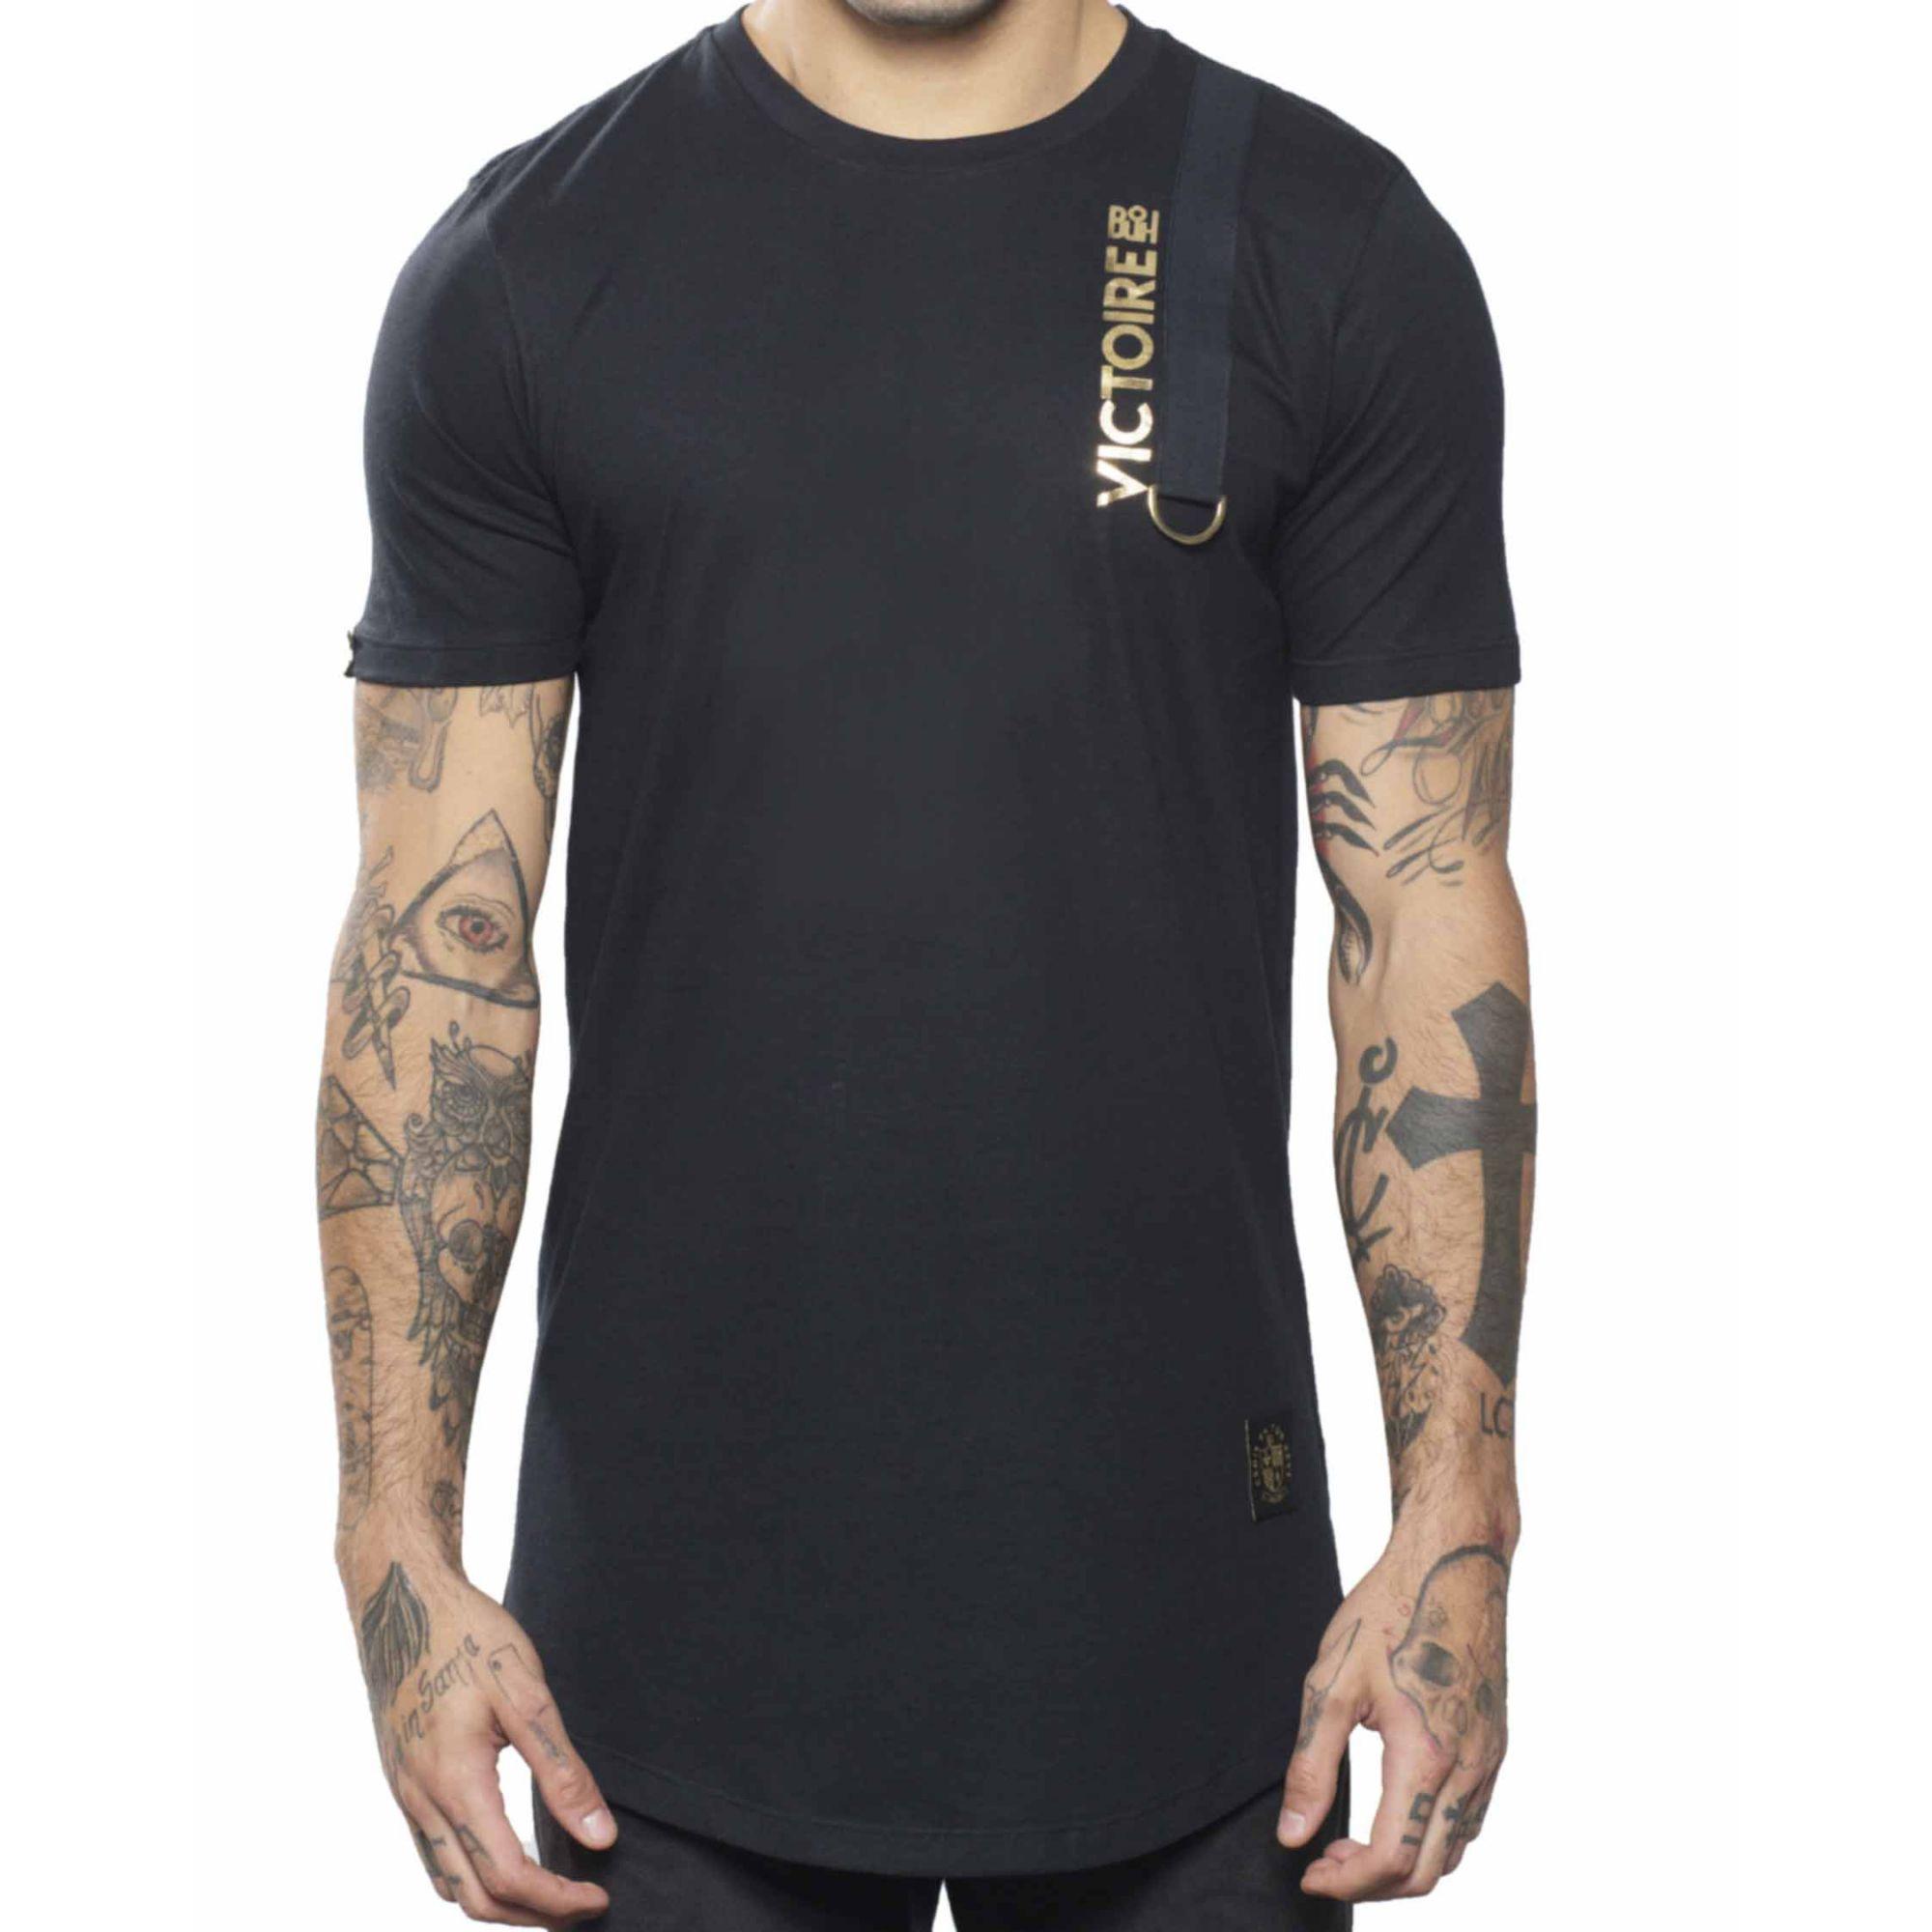 Camiseta Buh Victoire Black